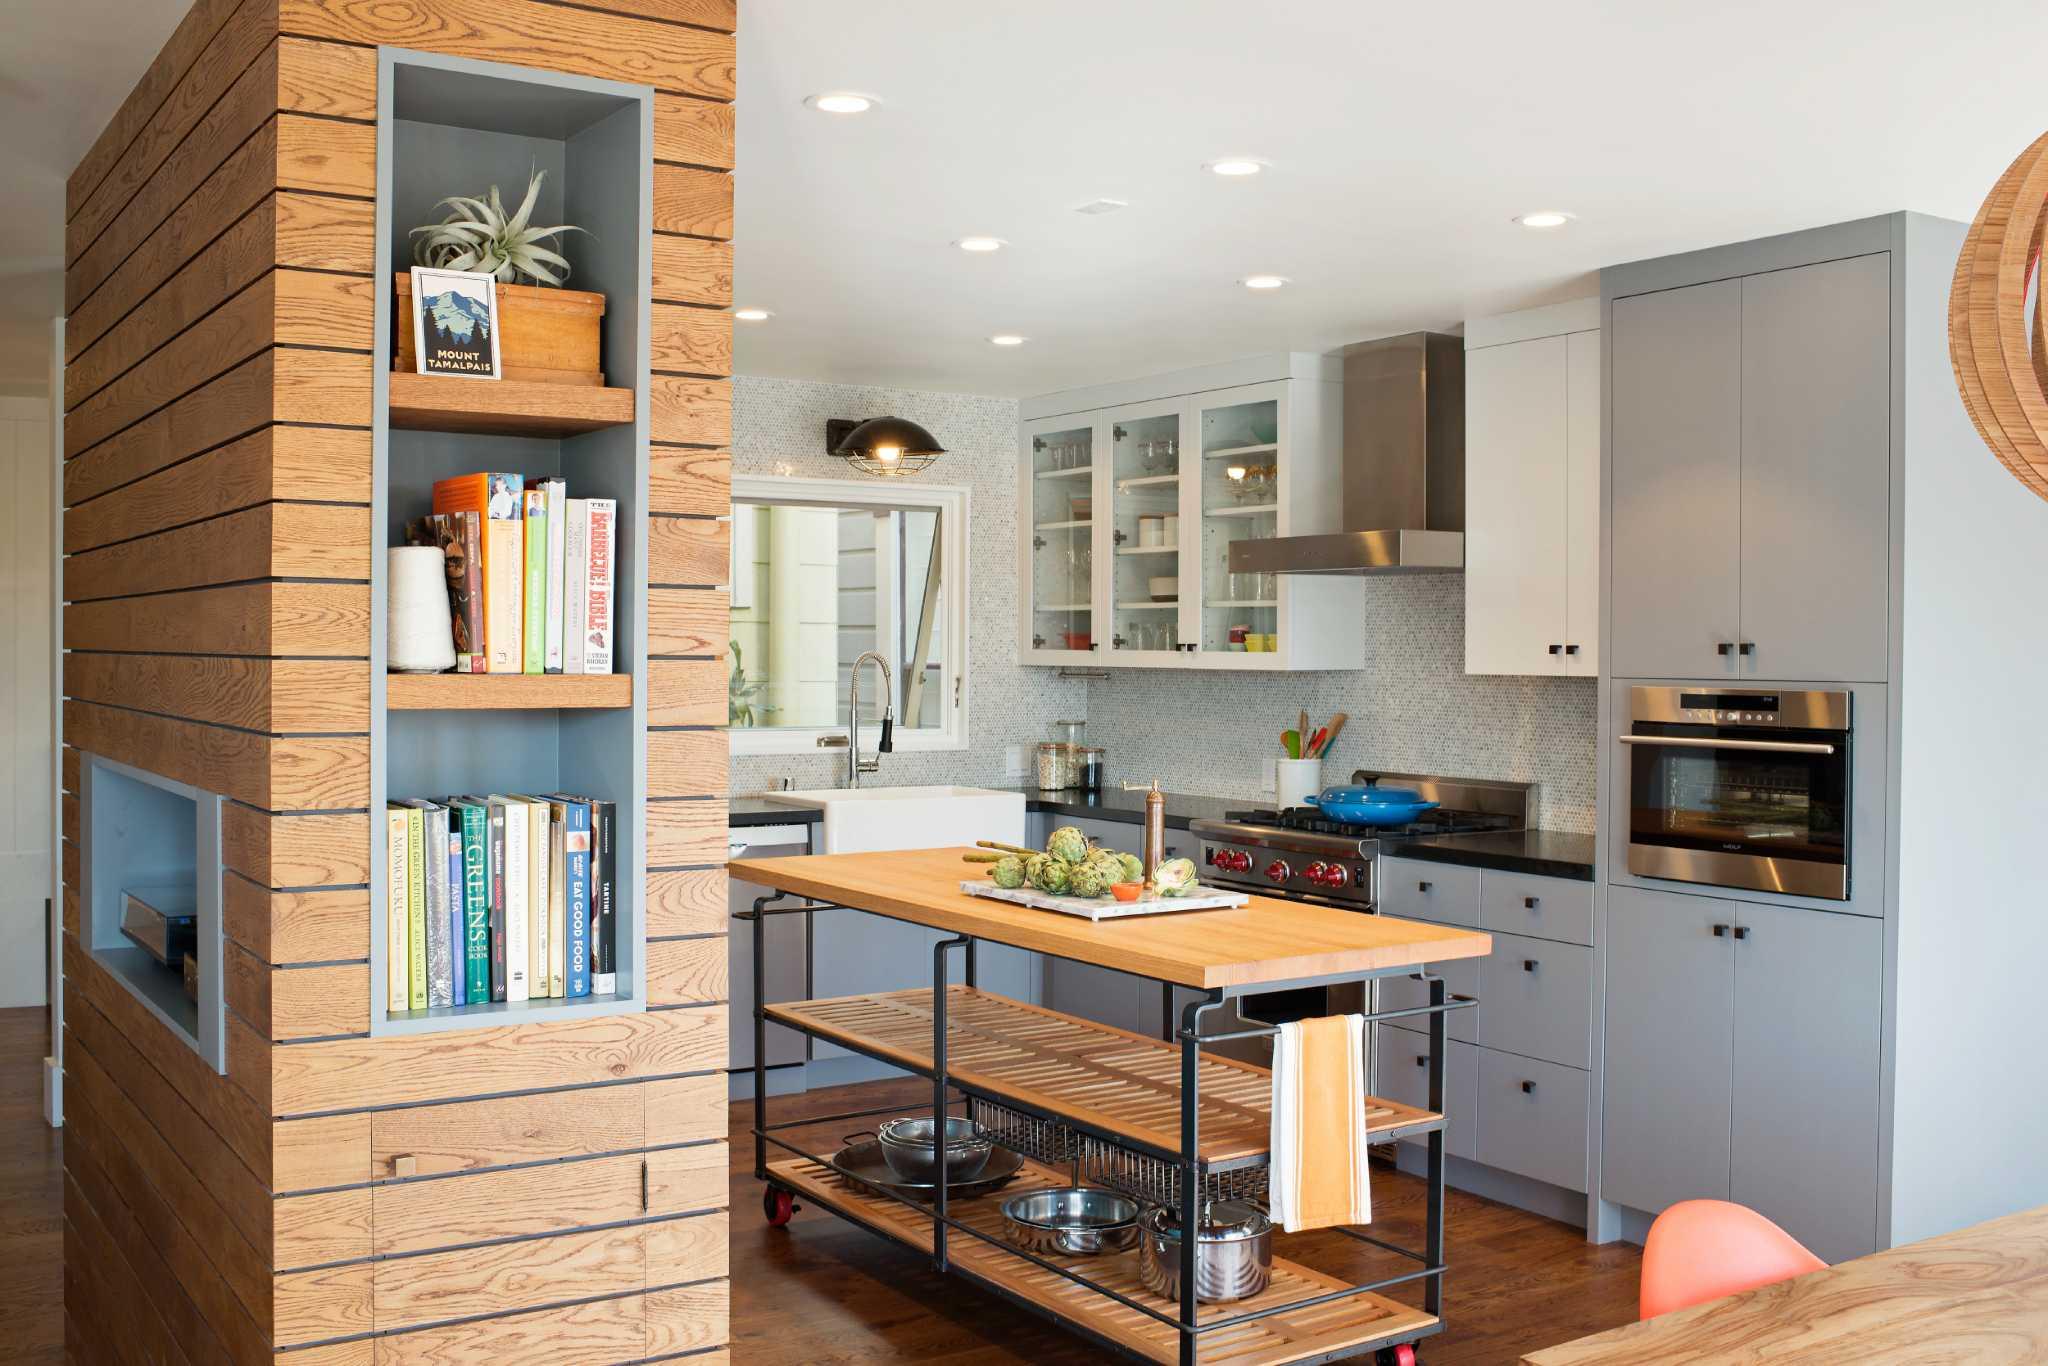 Texture builtins art transform 80s box into a home